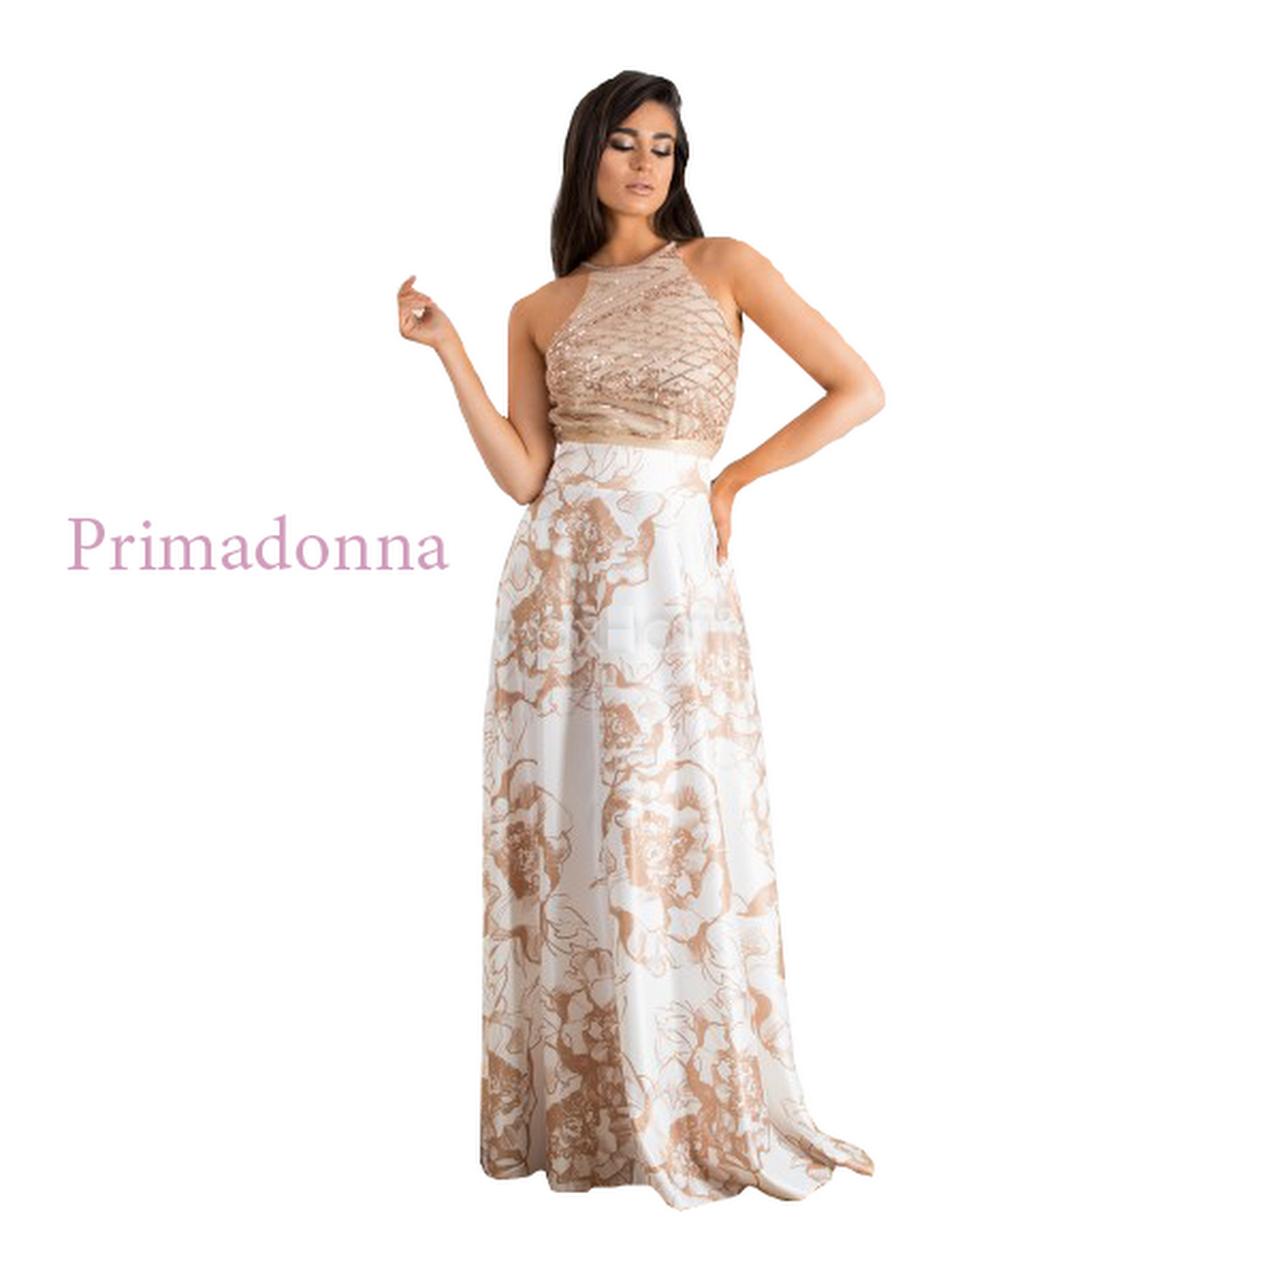 901efcbddc5c Primadonna   Γυναικεία - ρούχα - Κατάστημα γυναικείας ένδυσης στην Πάτρα